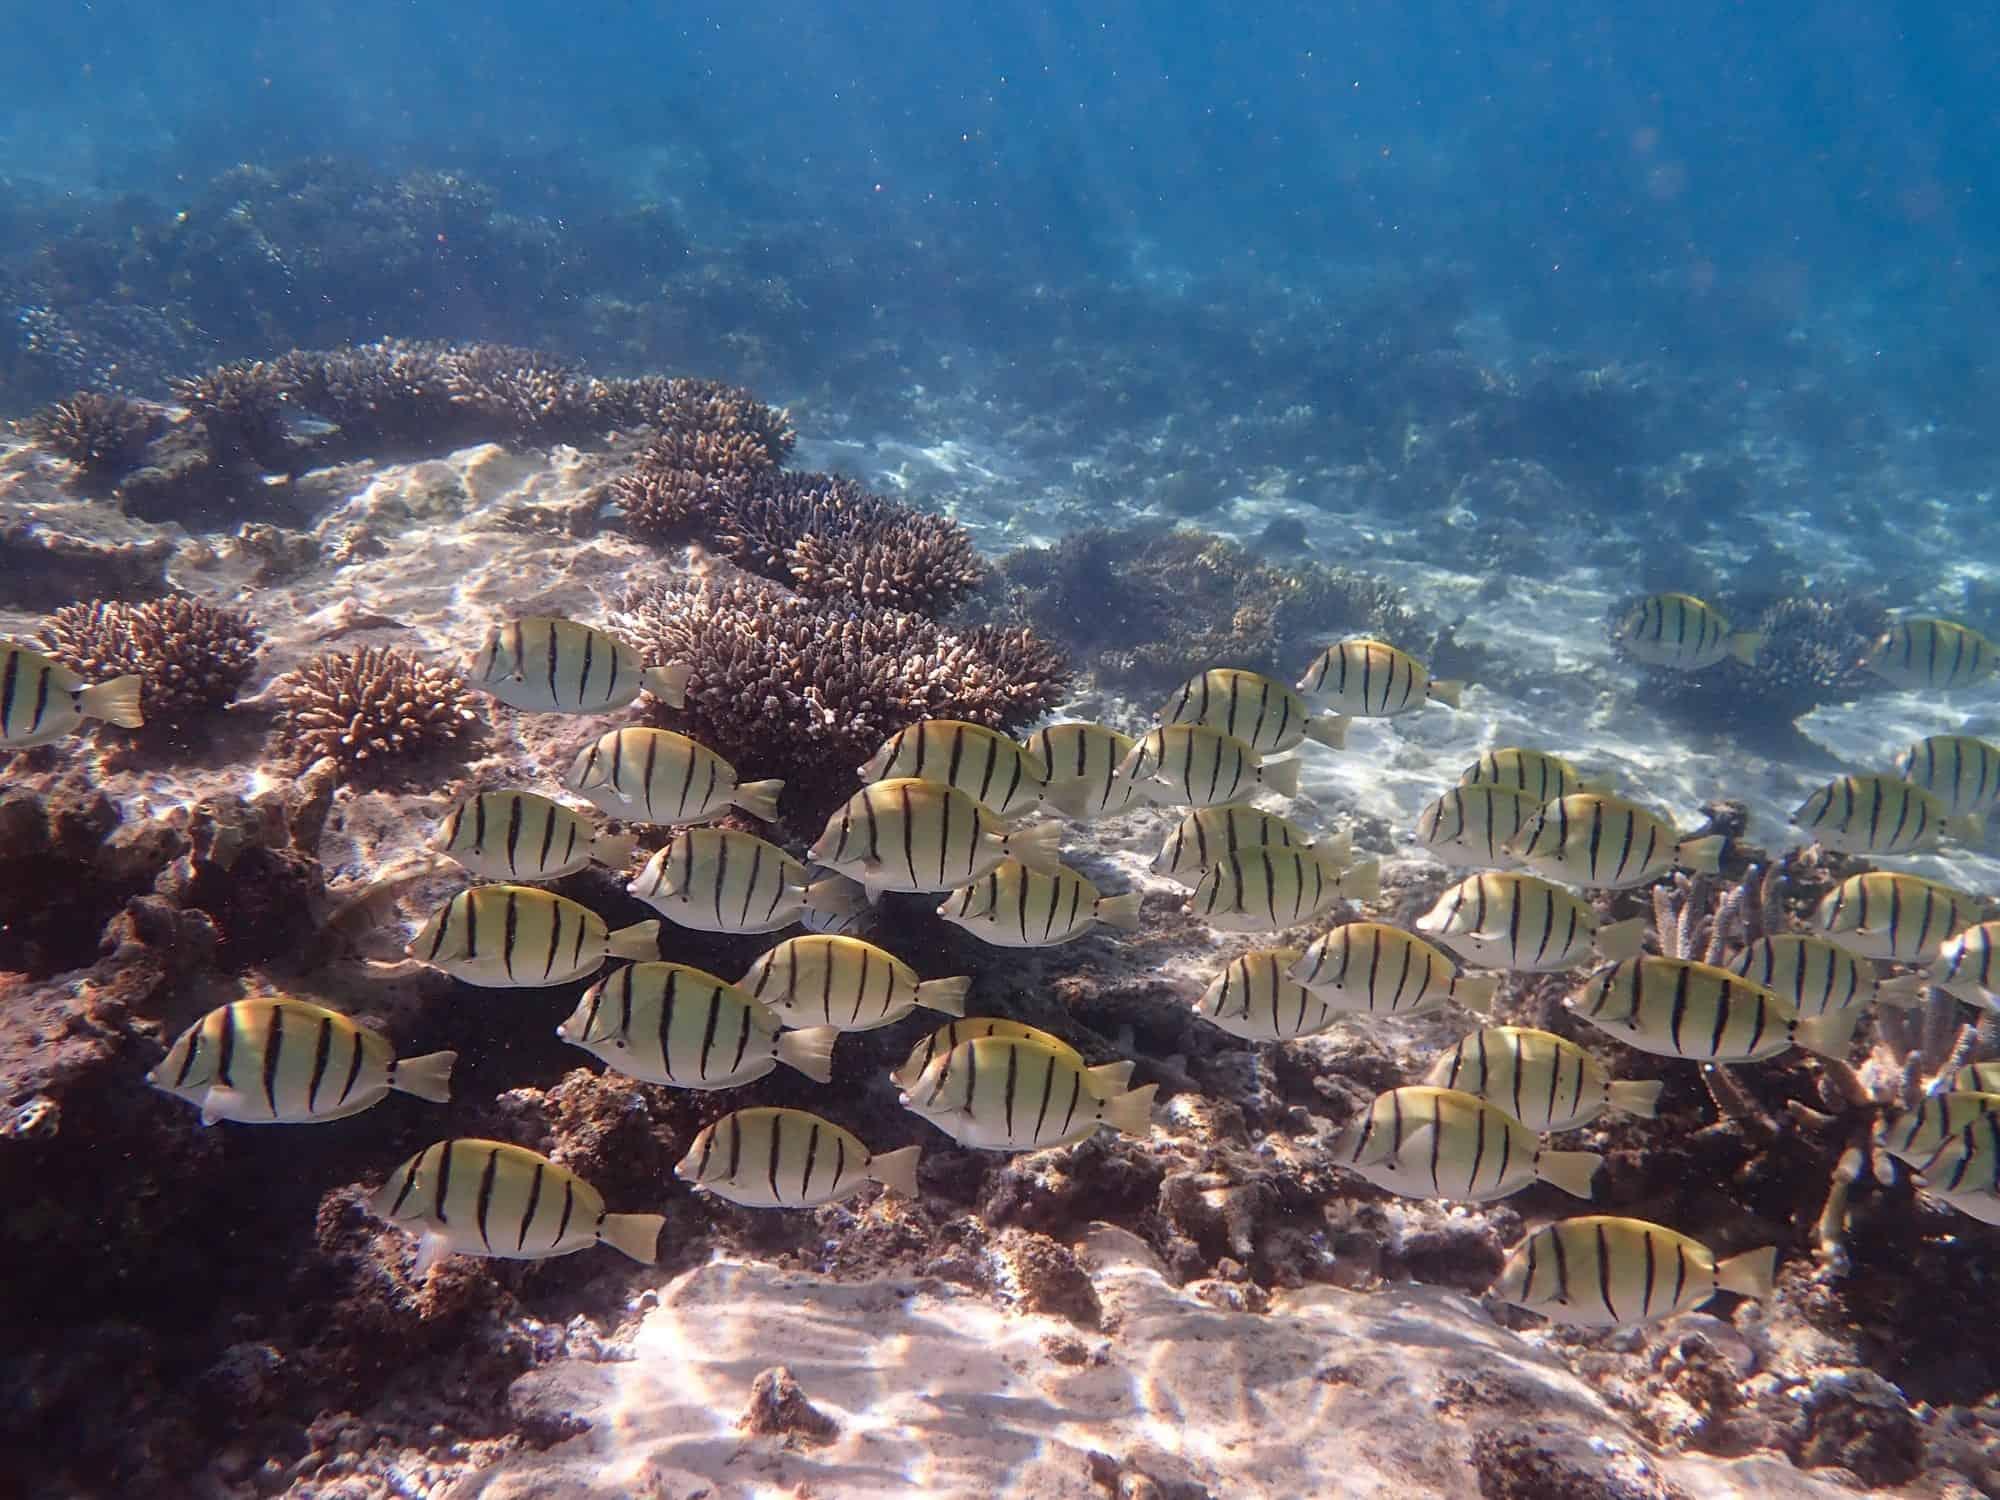 School of convict surgeon fish swimming Ningaloo Reef